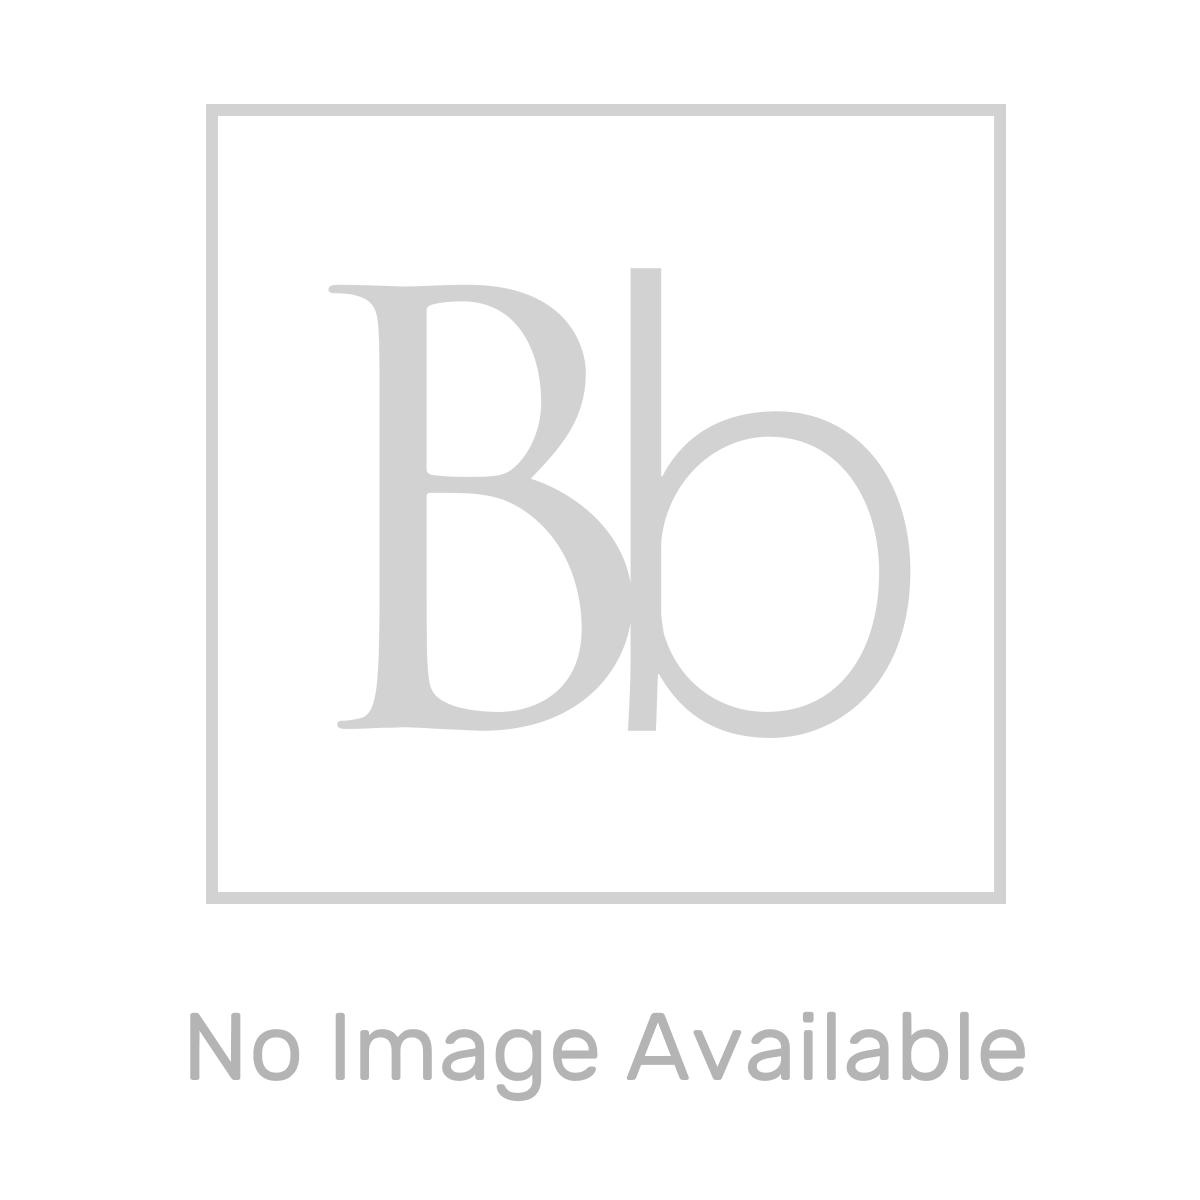 Croydex Chrome Cube Shower Curtain Ring